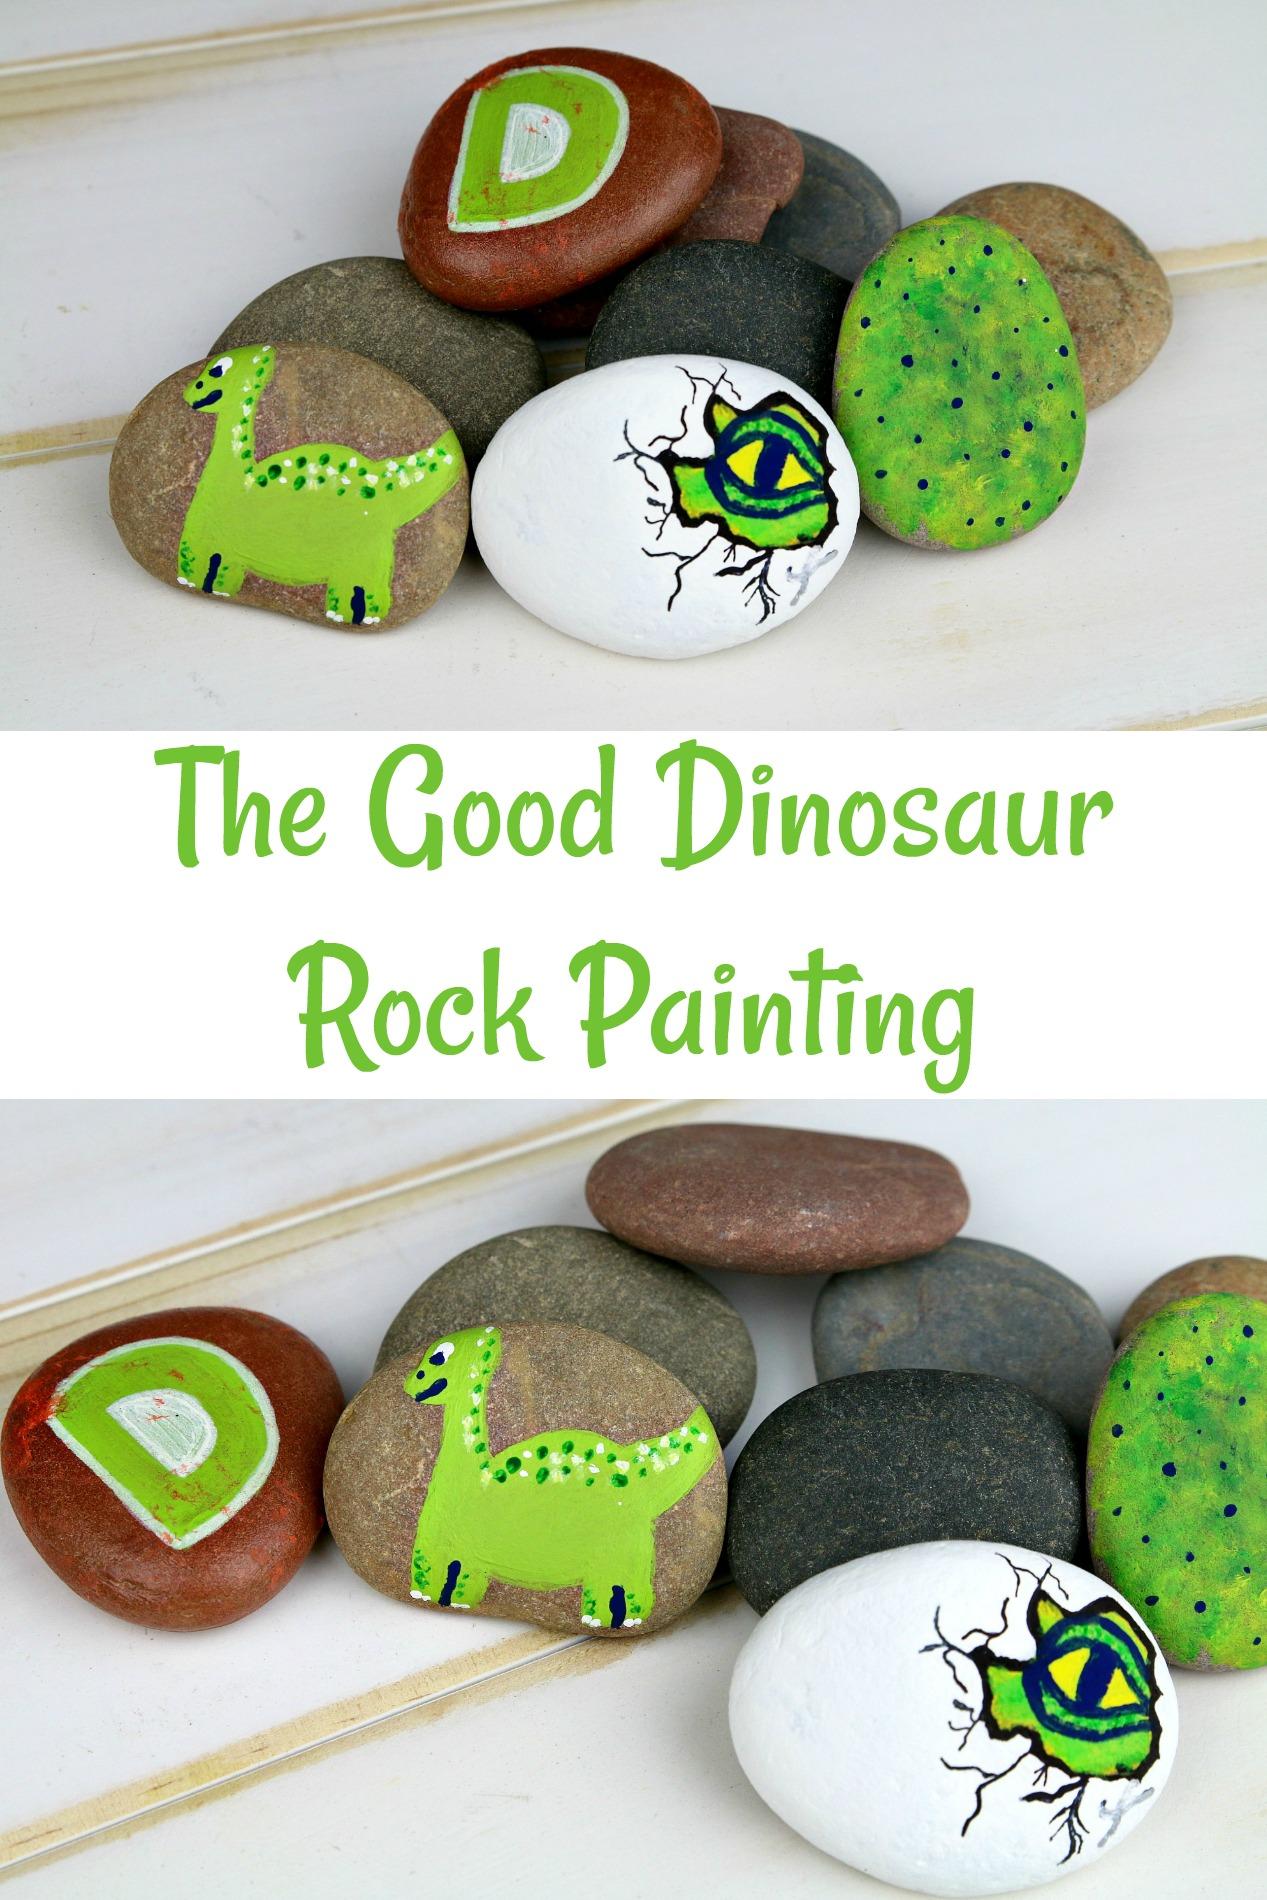 Disney Pixar The Good Dinosaur Rock Painting